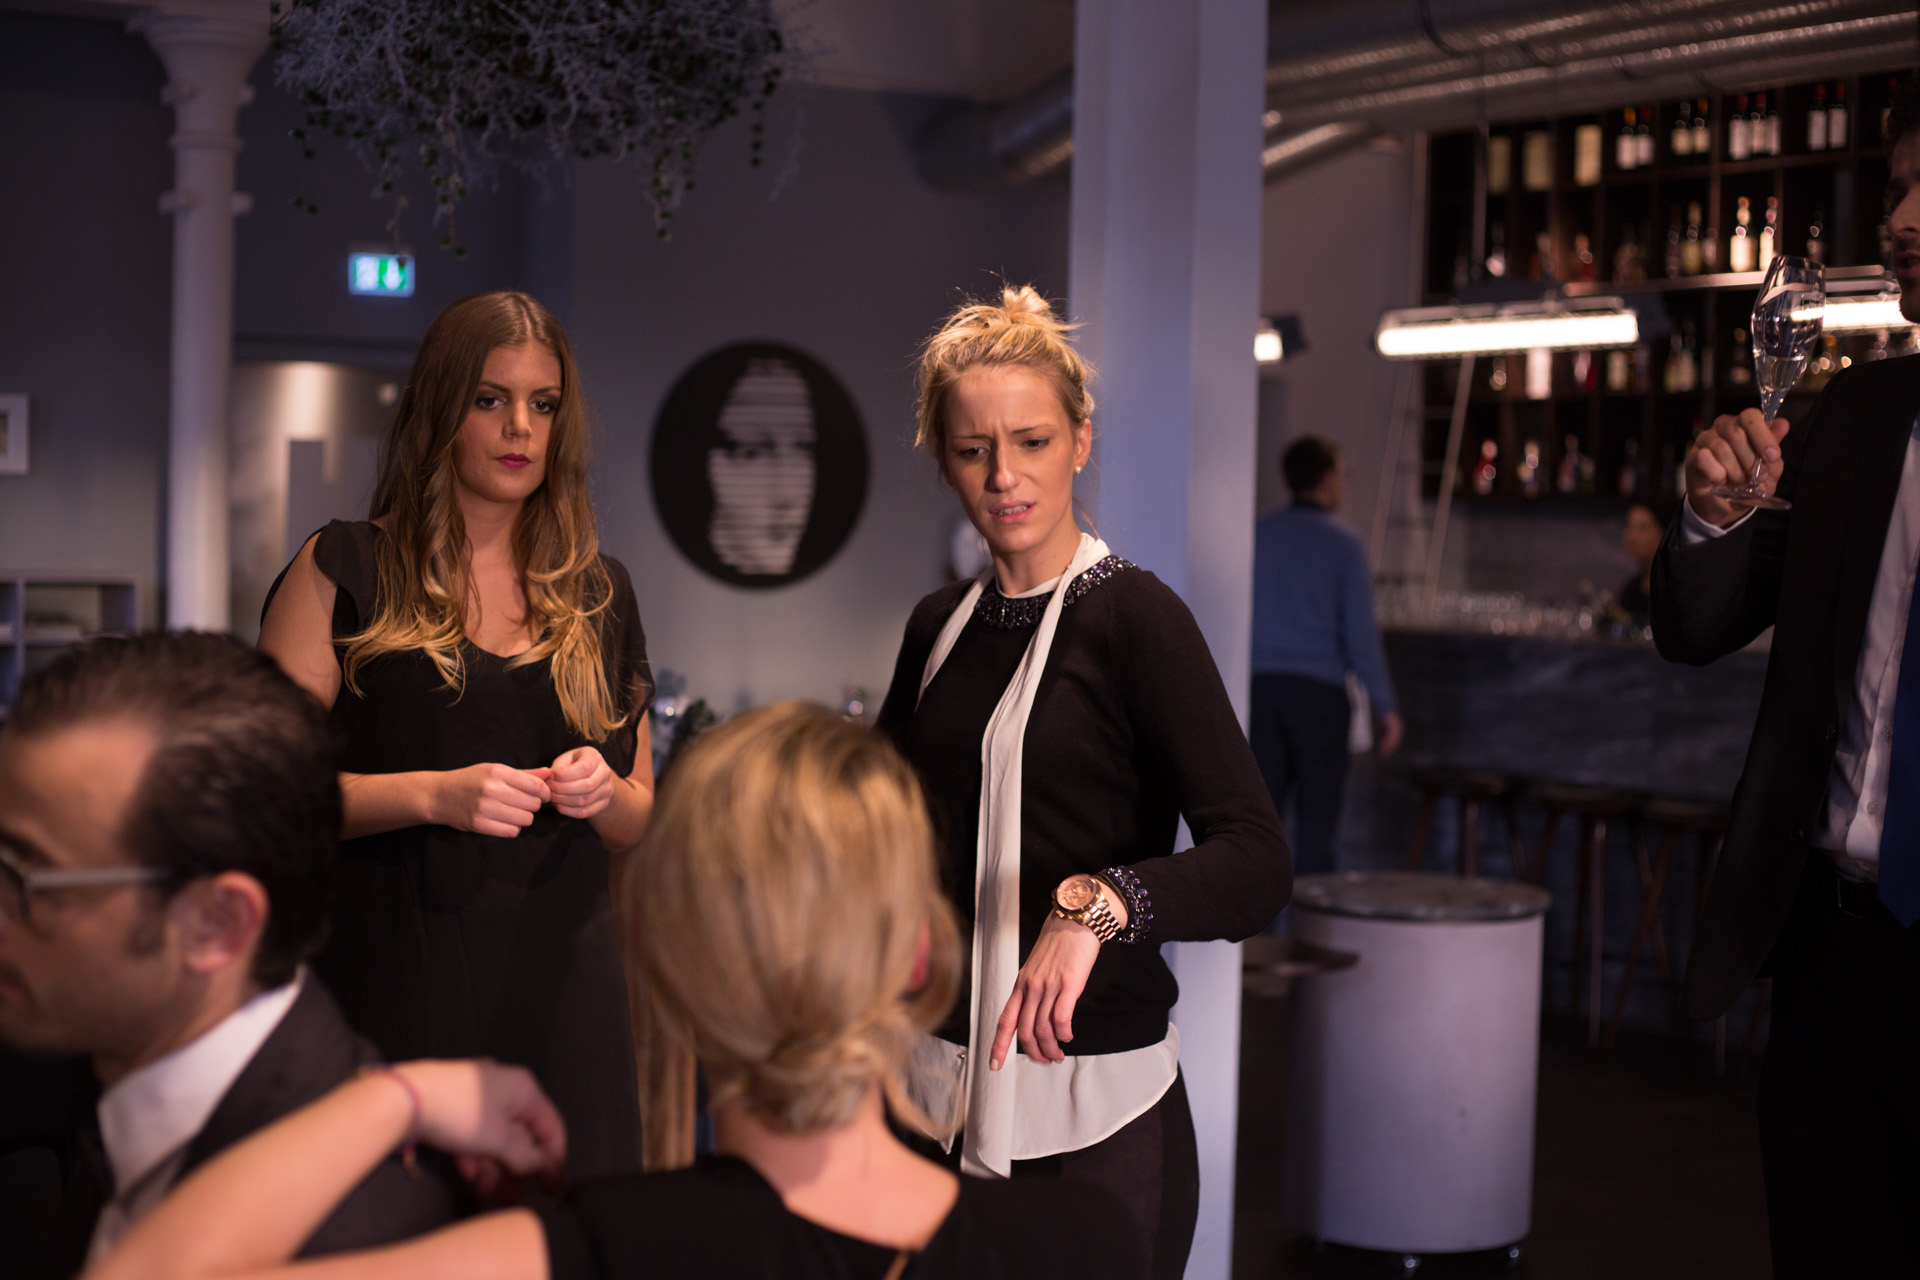 x-mas salonlocal Fotoshooting Kreative Direktor Christina Taska